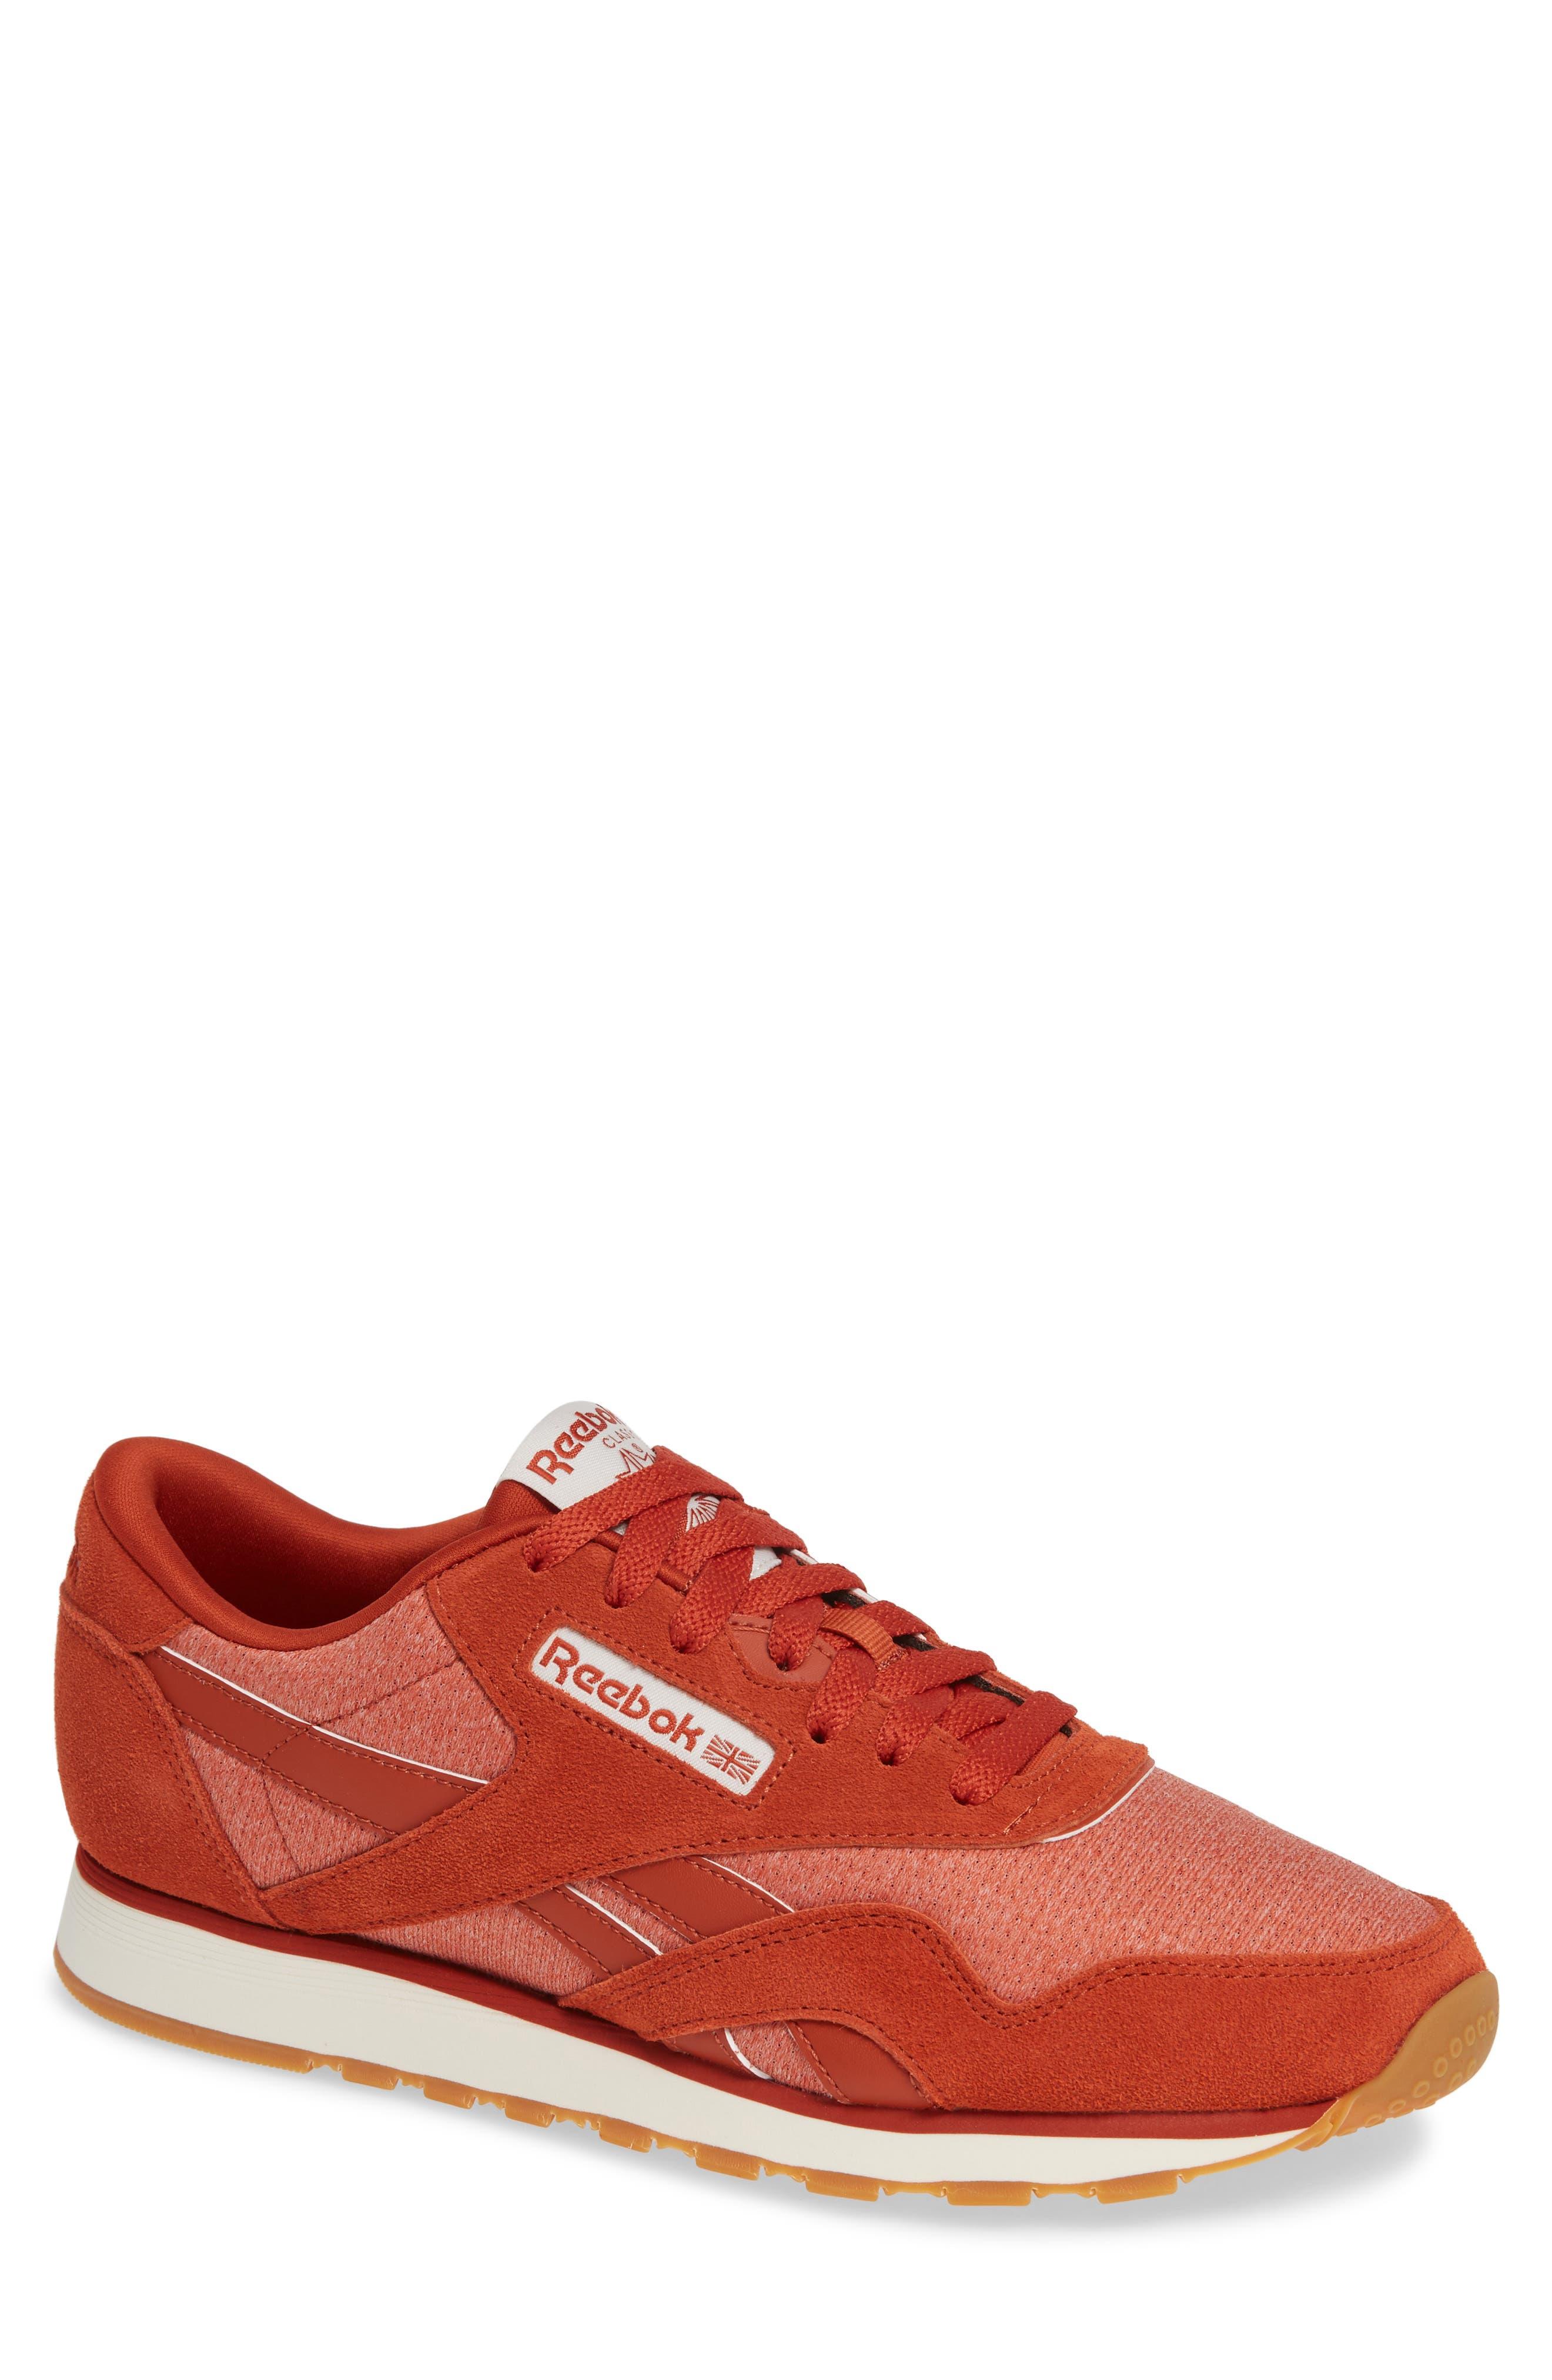 Classic Leather Nylon Sg Sneaker in Burnt Amber/ Chalk